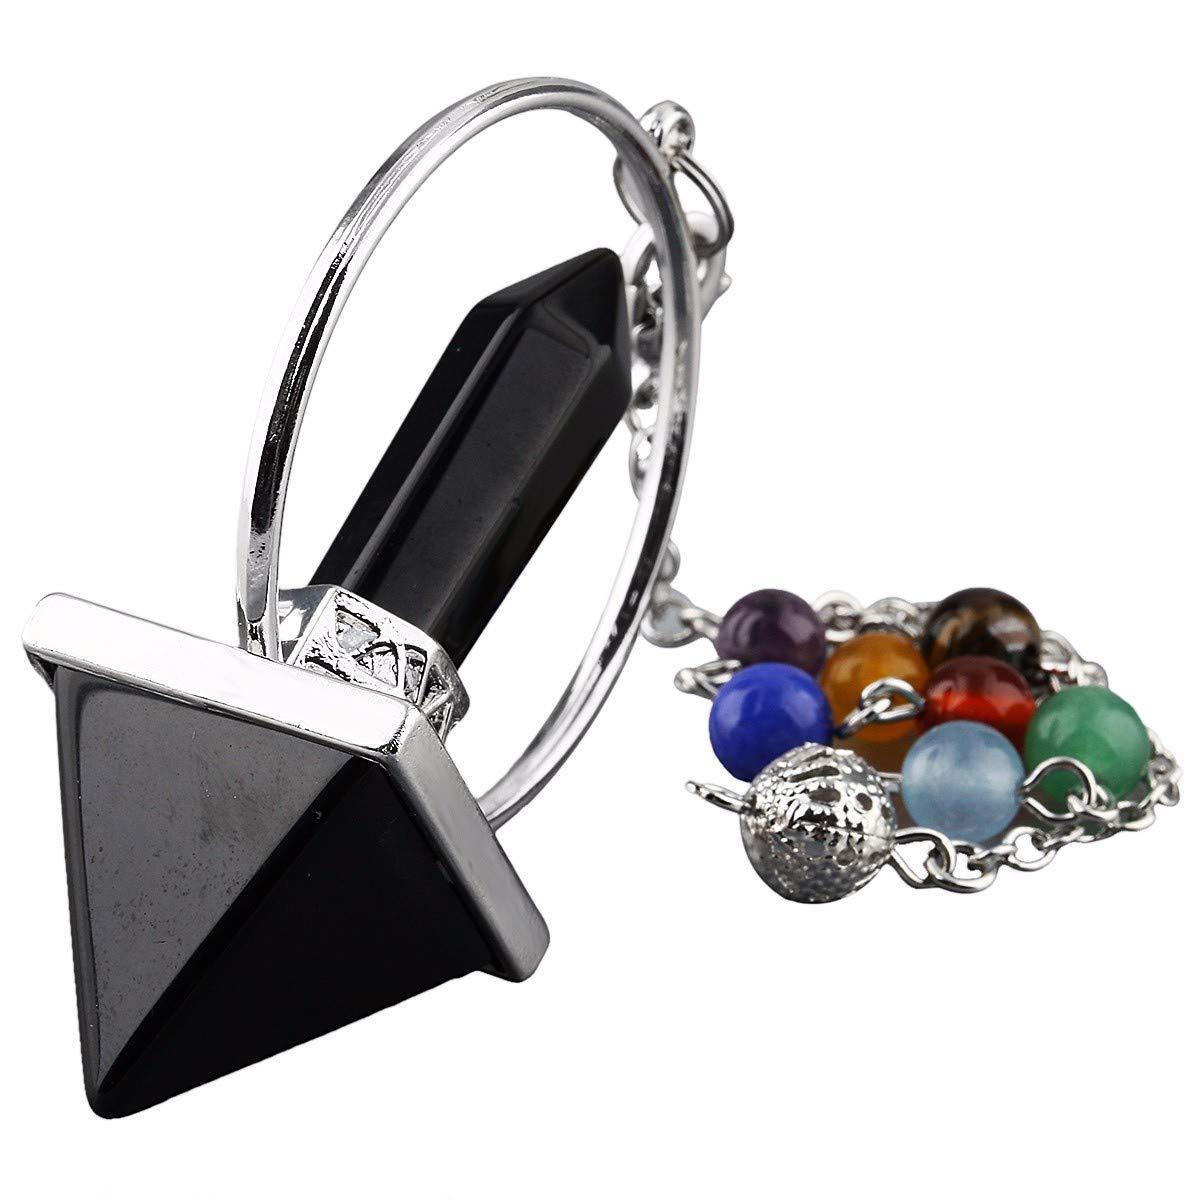 TUMBEELLUWA Healing Crystal Quartz 7 Chakra Pendulum Dowsing Gemstone Divination Reiki Stone,Obsidian